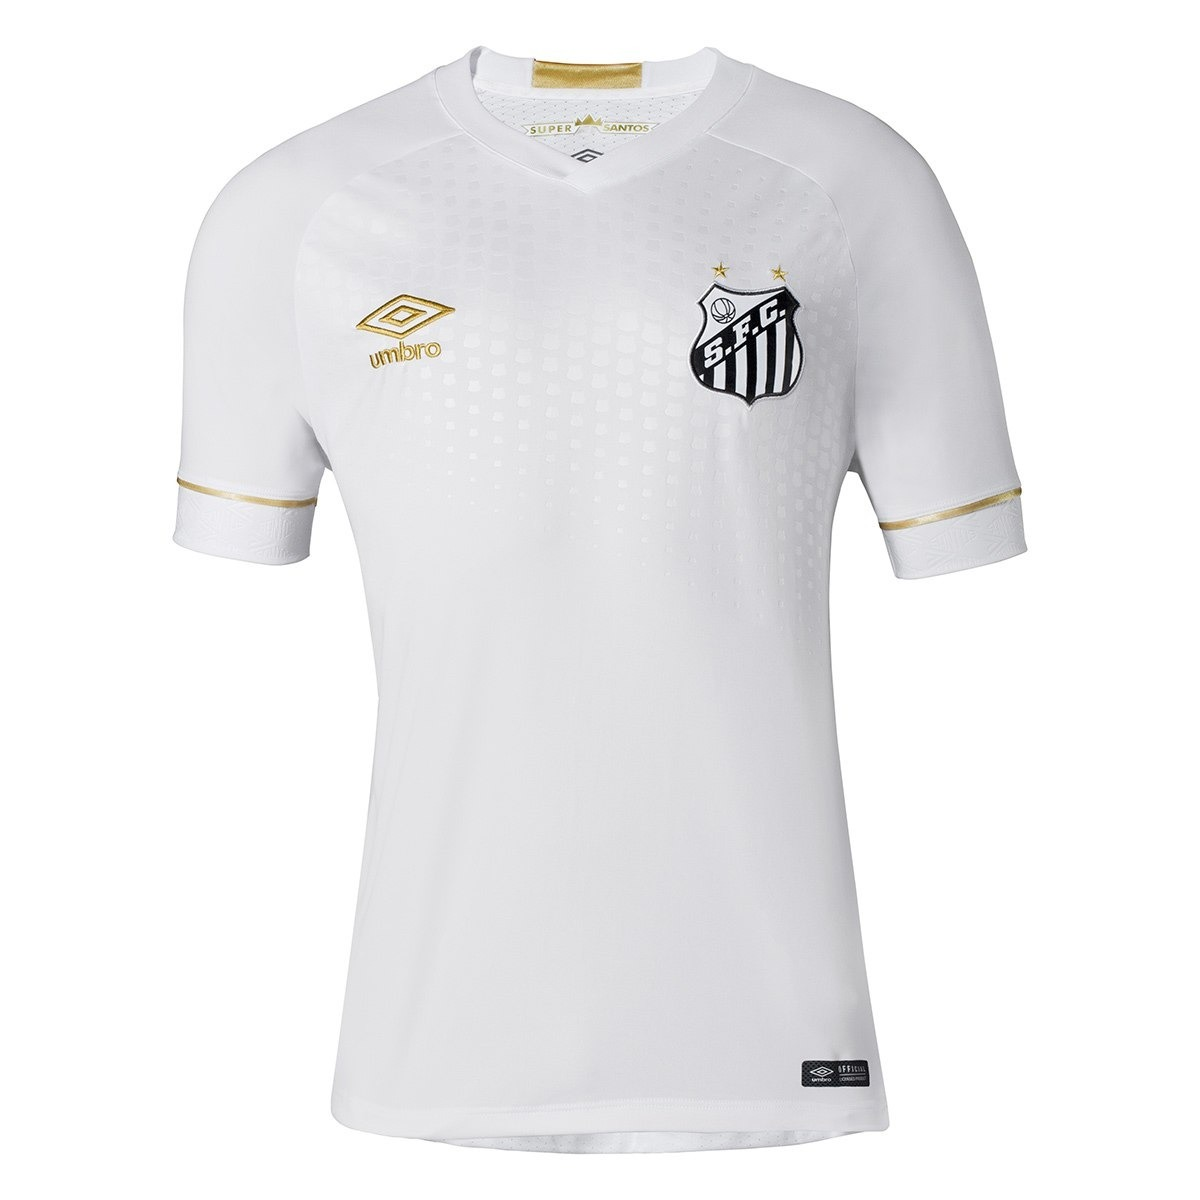 camisa santos 2018 - torcedor umbro masculina. Carregando zoom. 0685abb1ec7ac